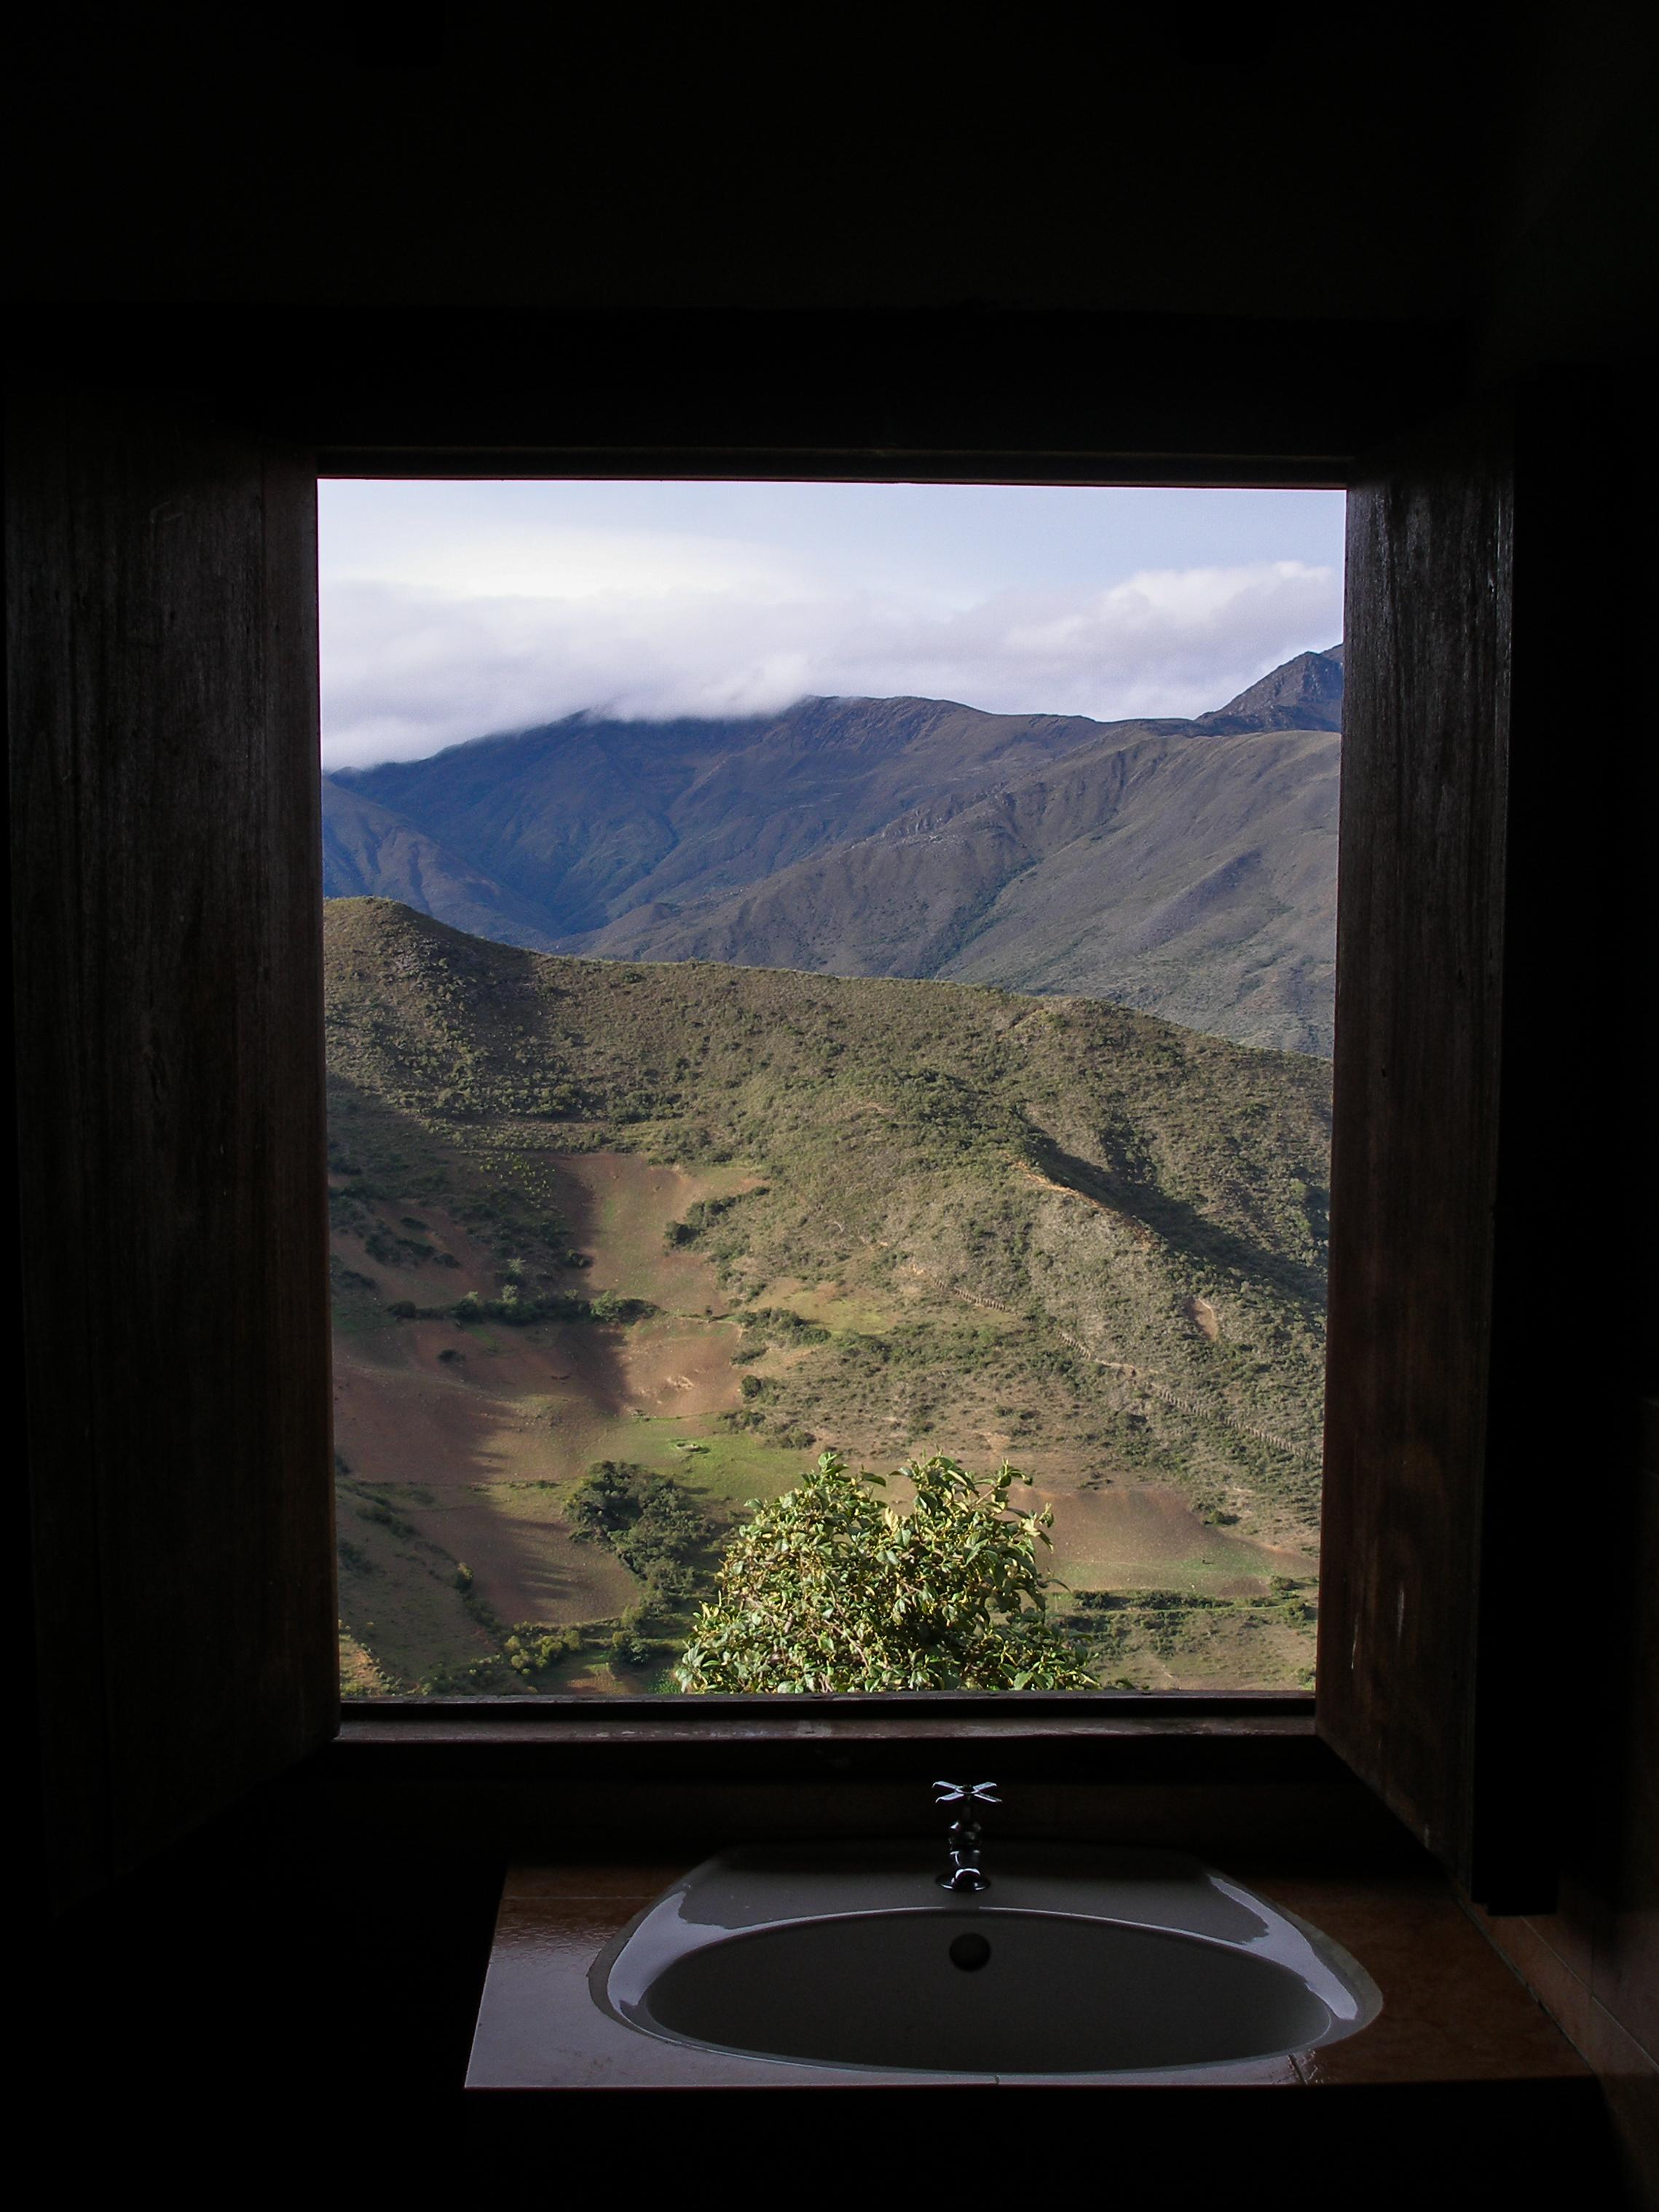 Sierra Nevada, Venezuela, South America